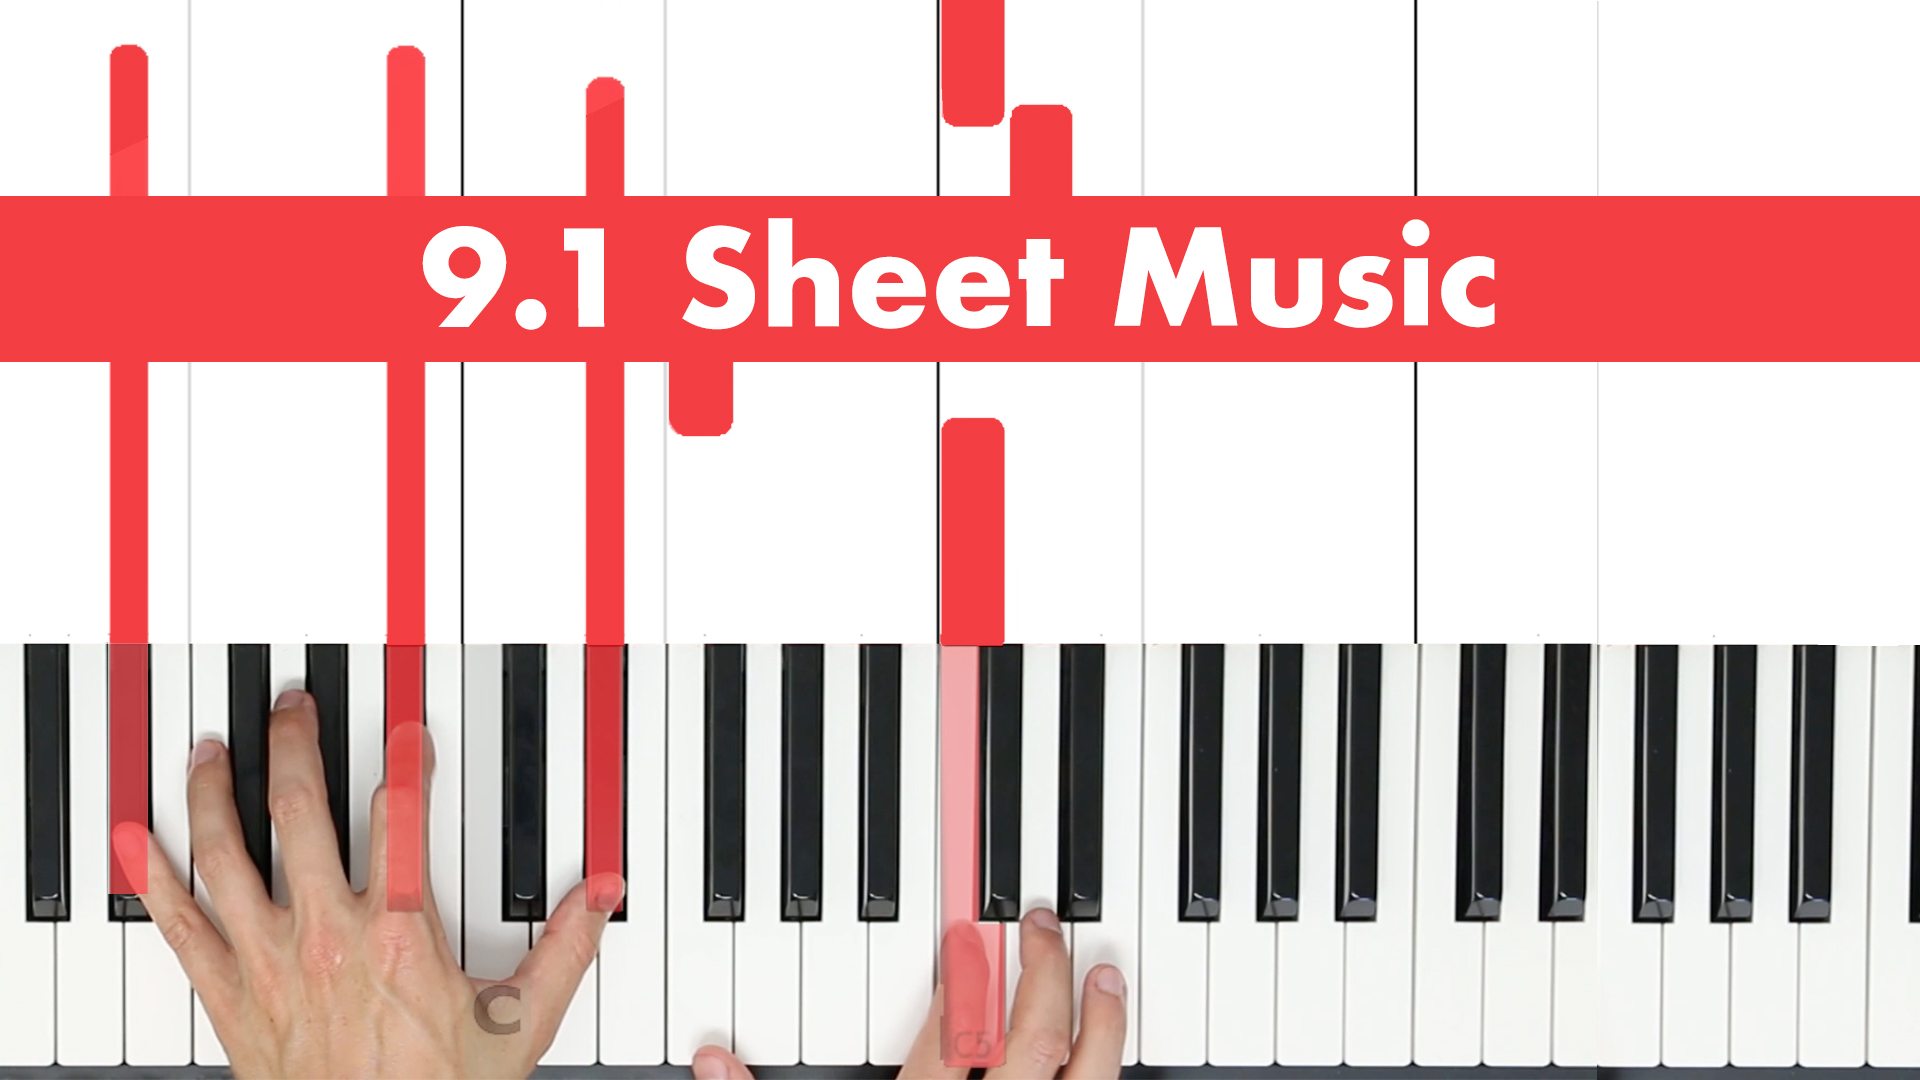 9.1 Sheet Music